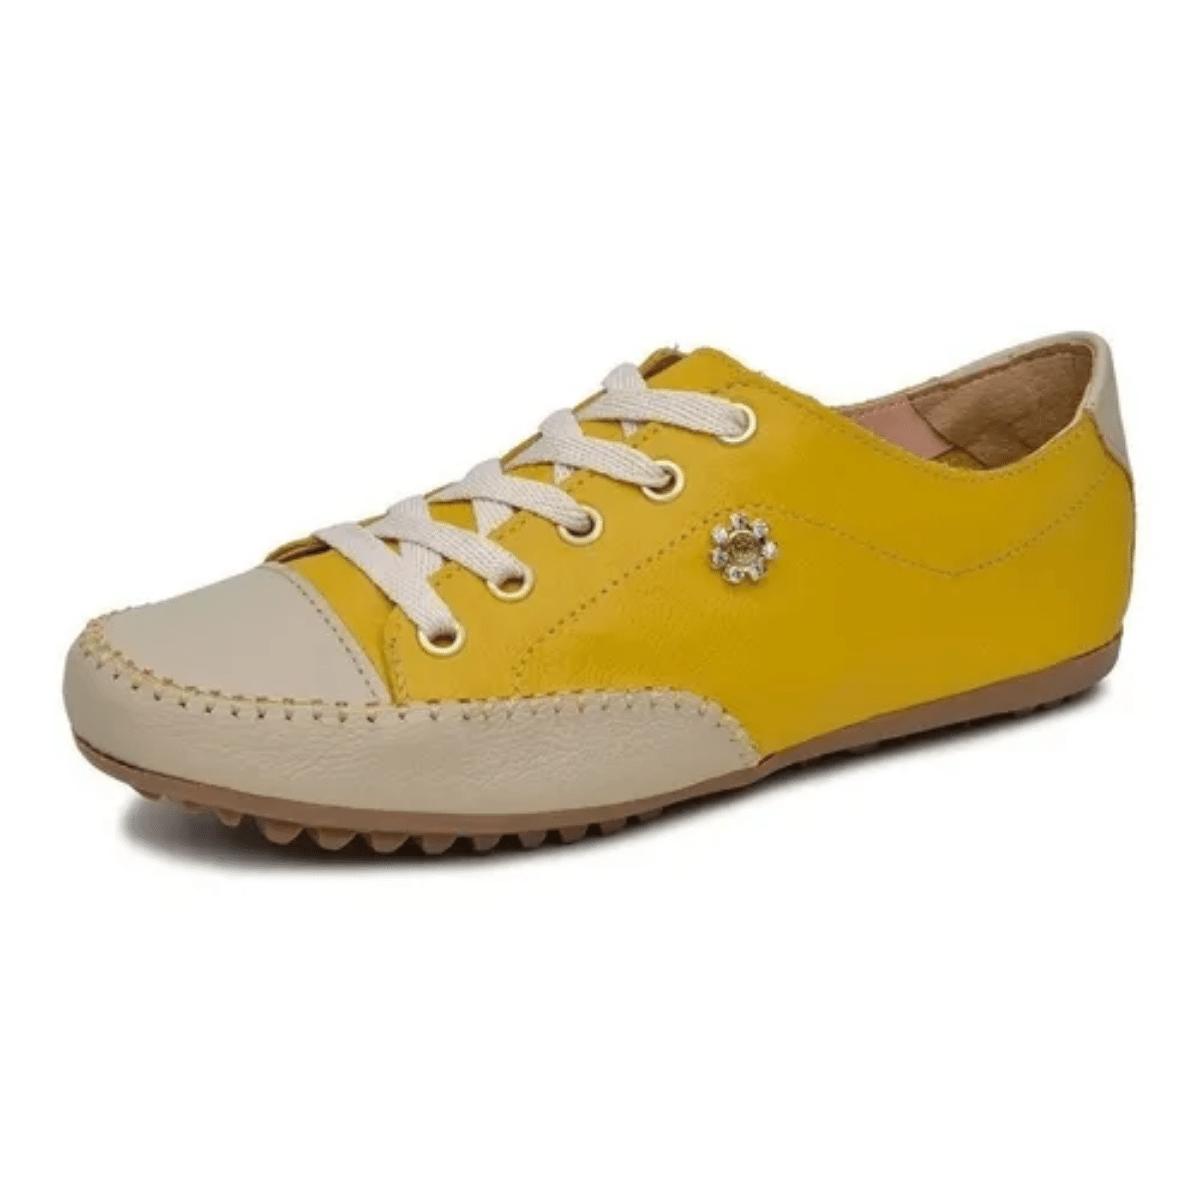 Tênis Feminino Casual Gommix Couro Amarelo e Bege